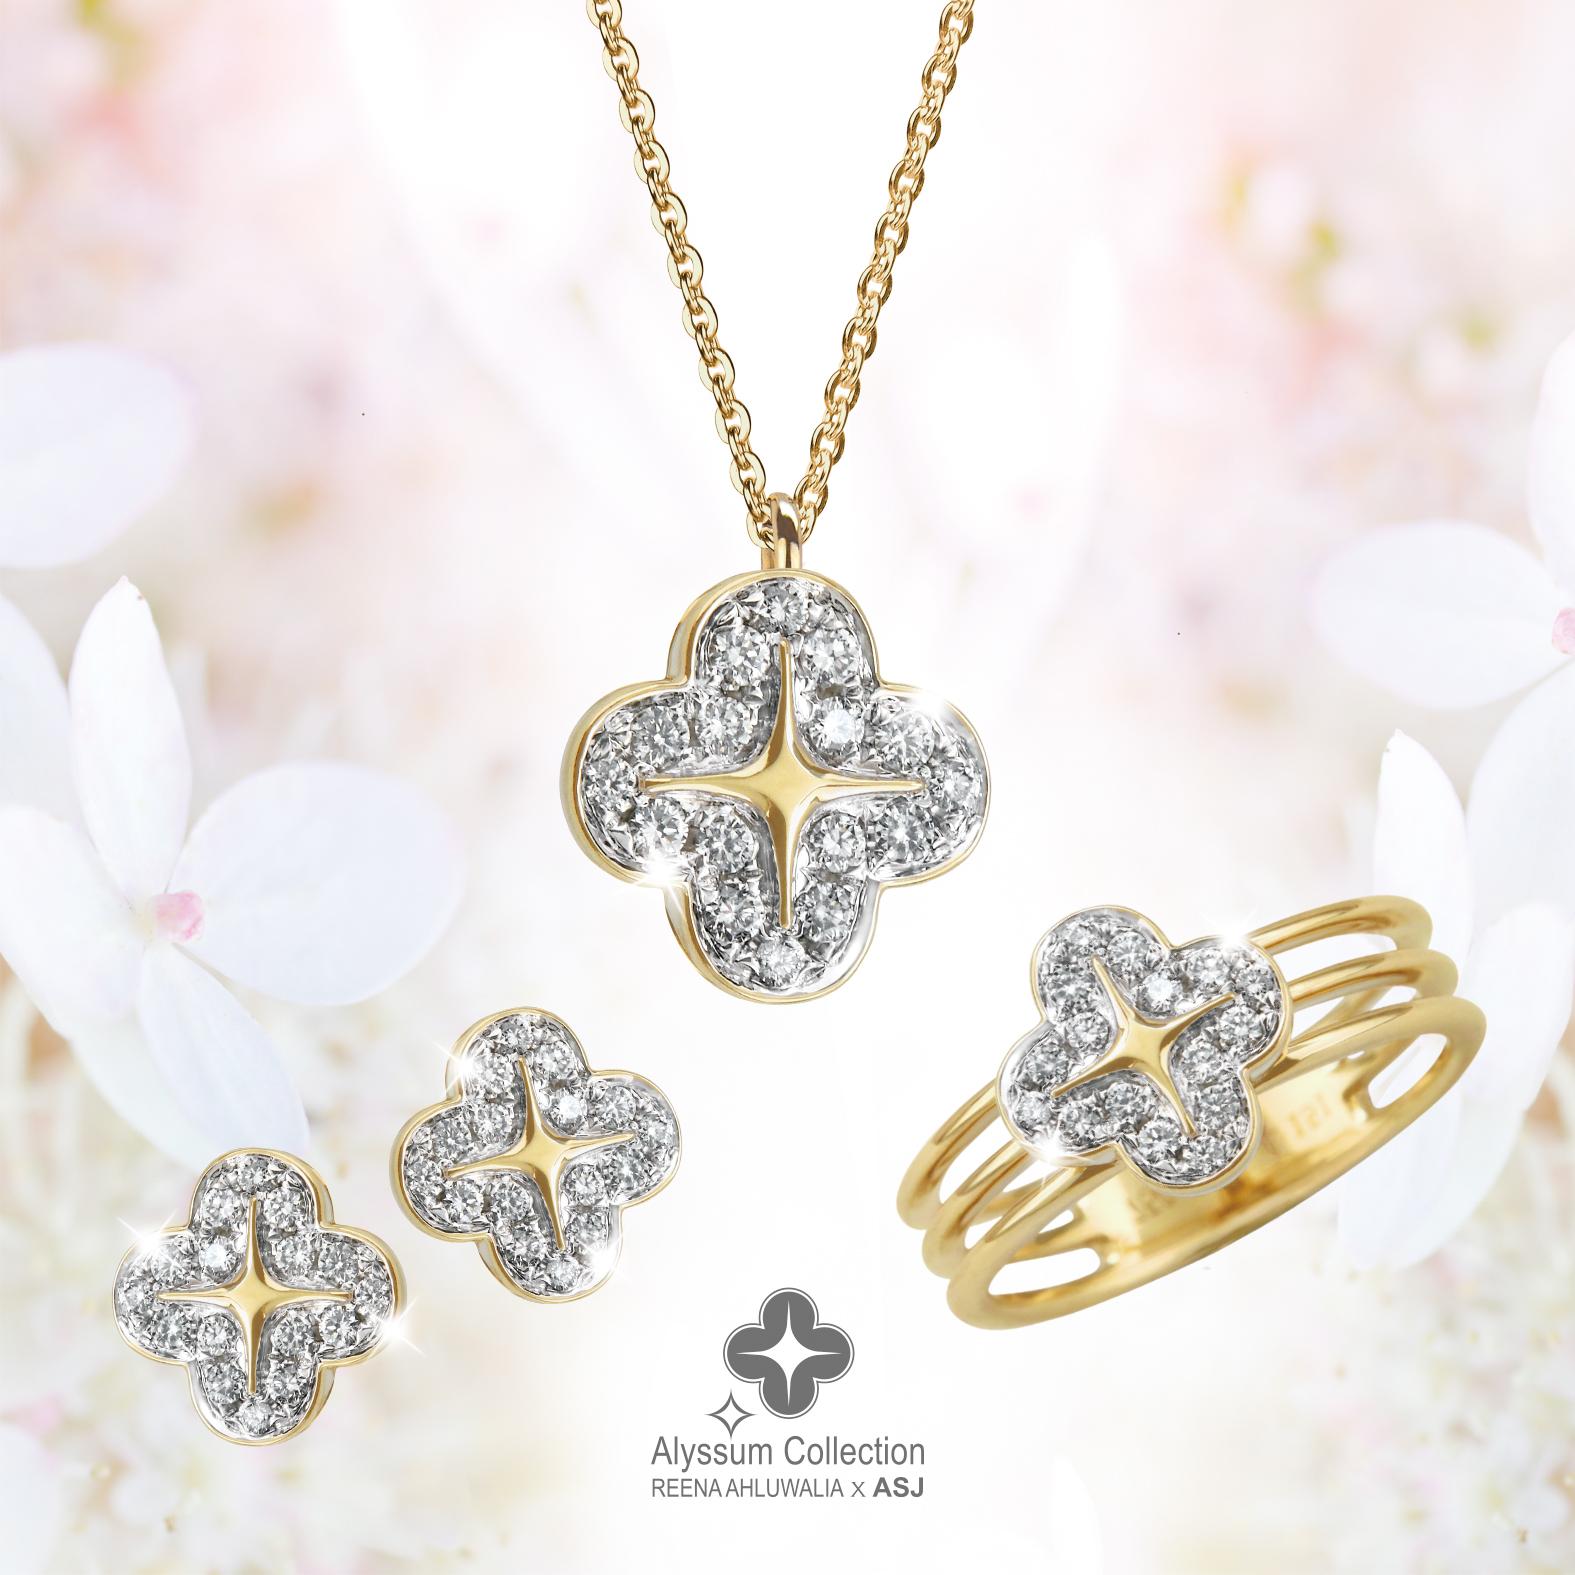 3_Alyssum Collection  By Reena Ahluwalia_Gold_Diamonds.jpg